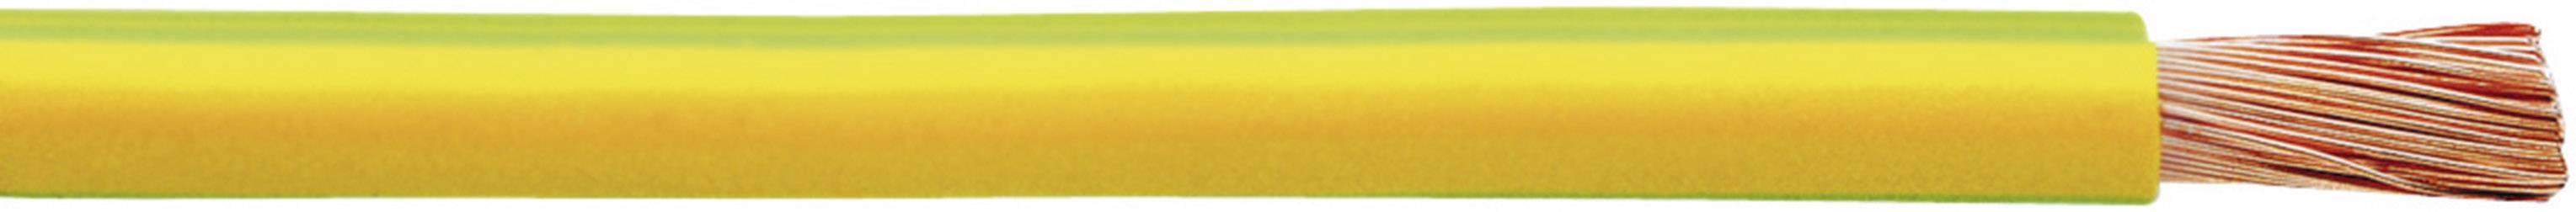 Pletenica H07V-K 1 x 2.50 mm, svetlo modra Faber Kabel 040227 100 m